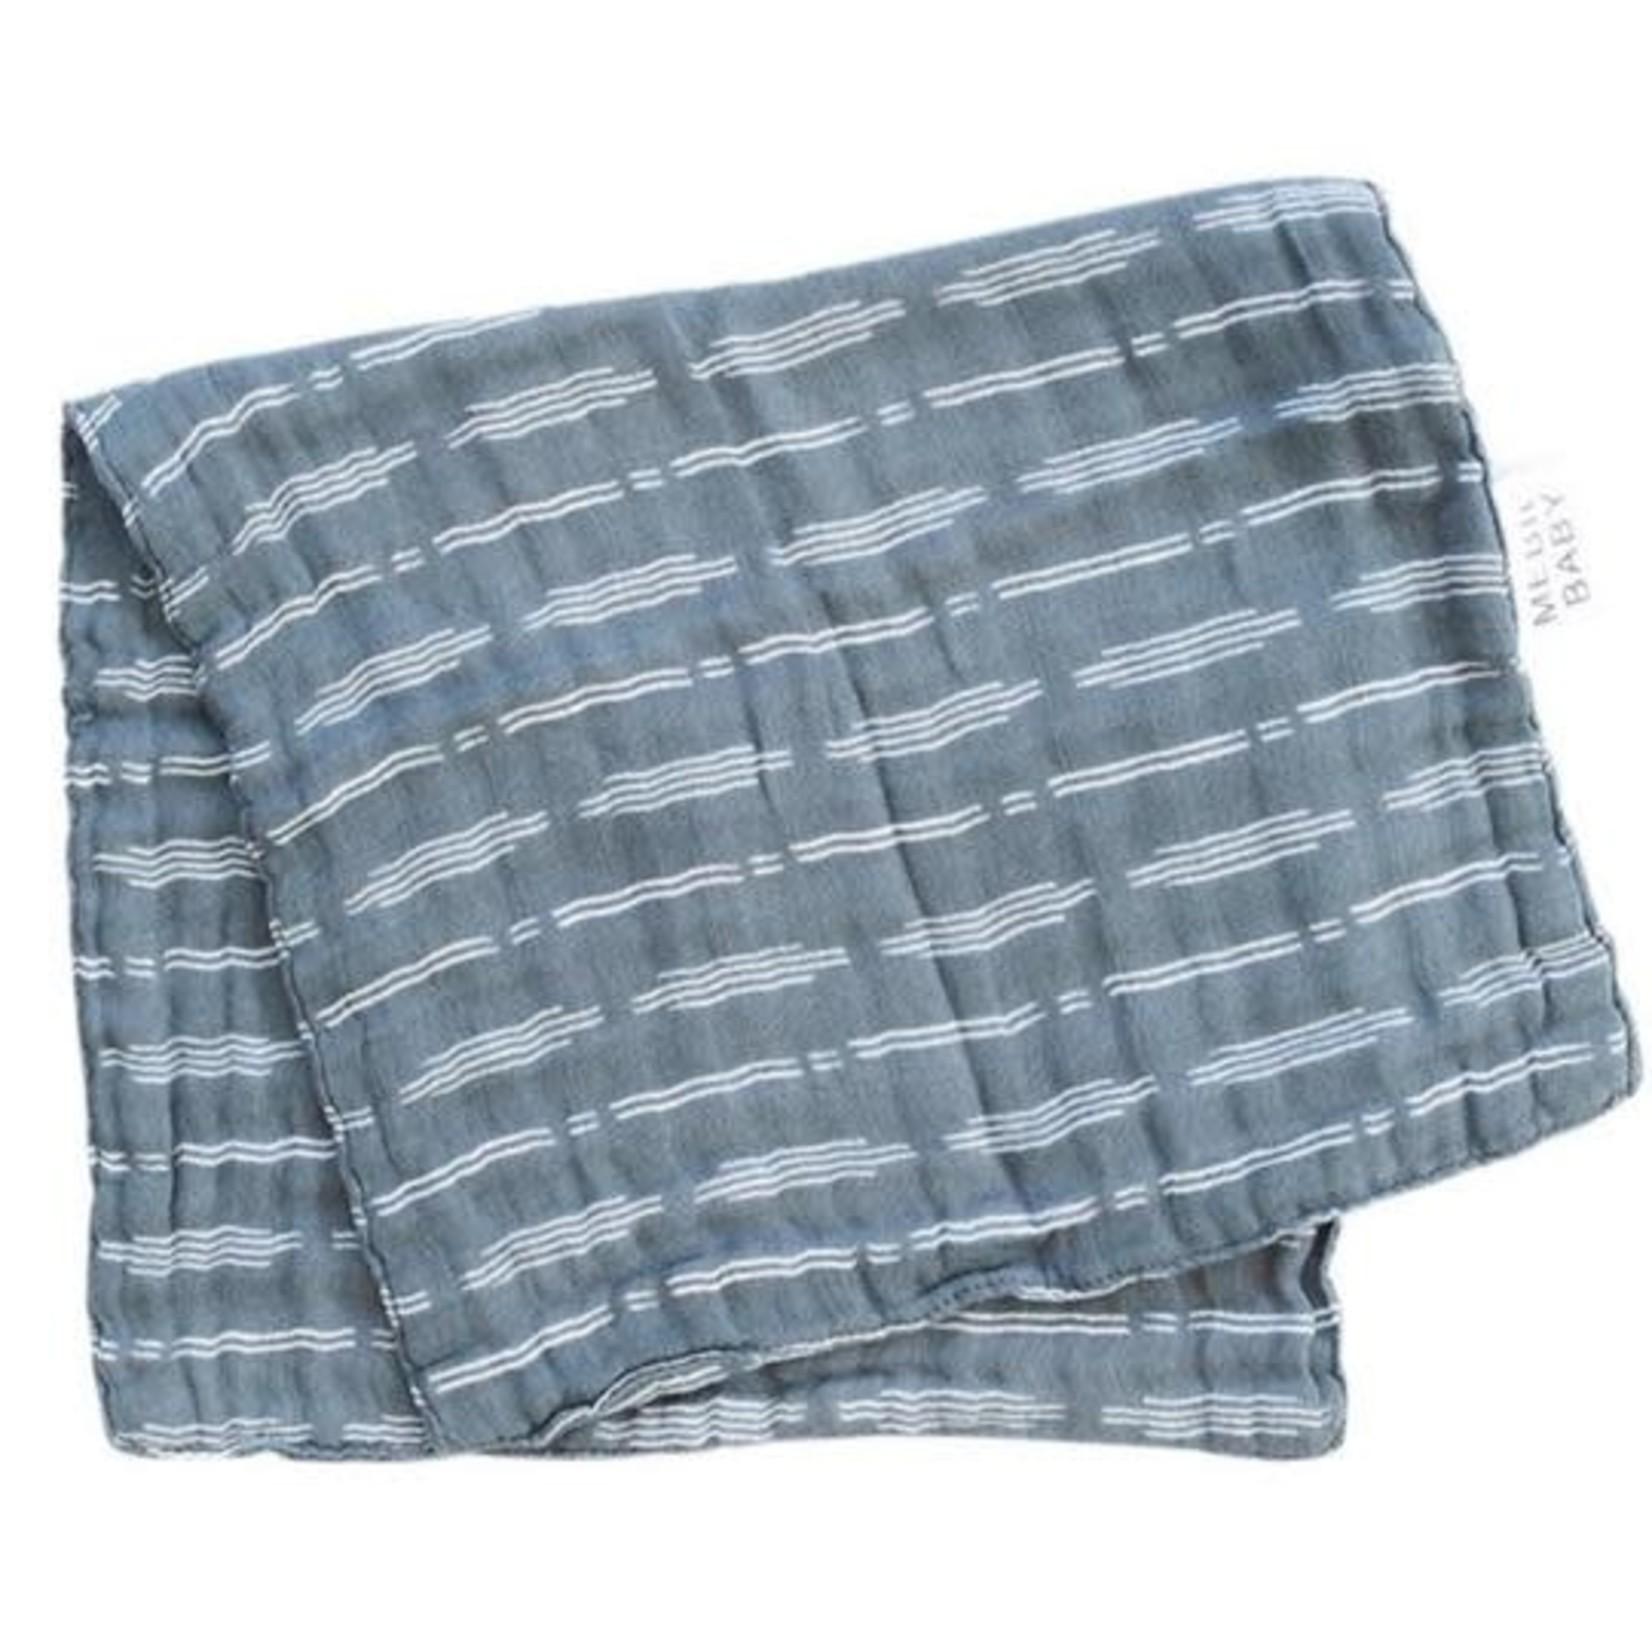 Mebie Baby Burp Cloth - Dusty Blue Horizon